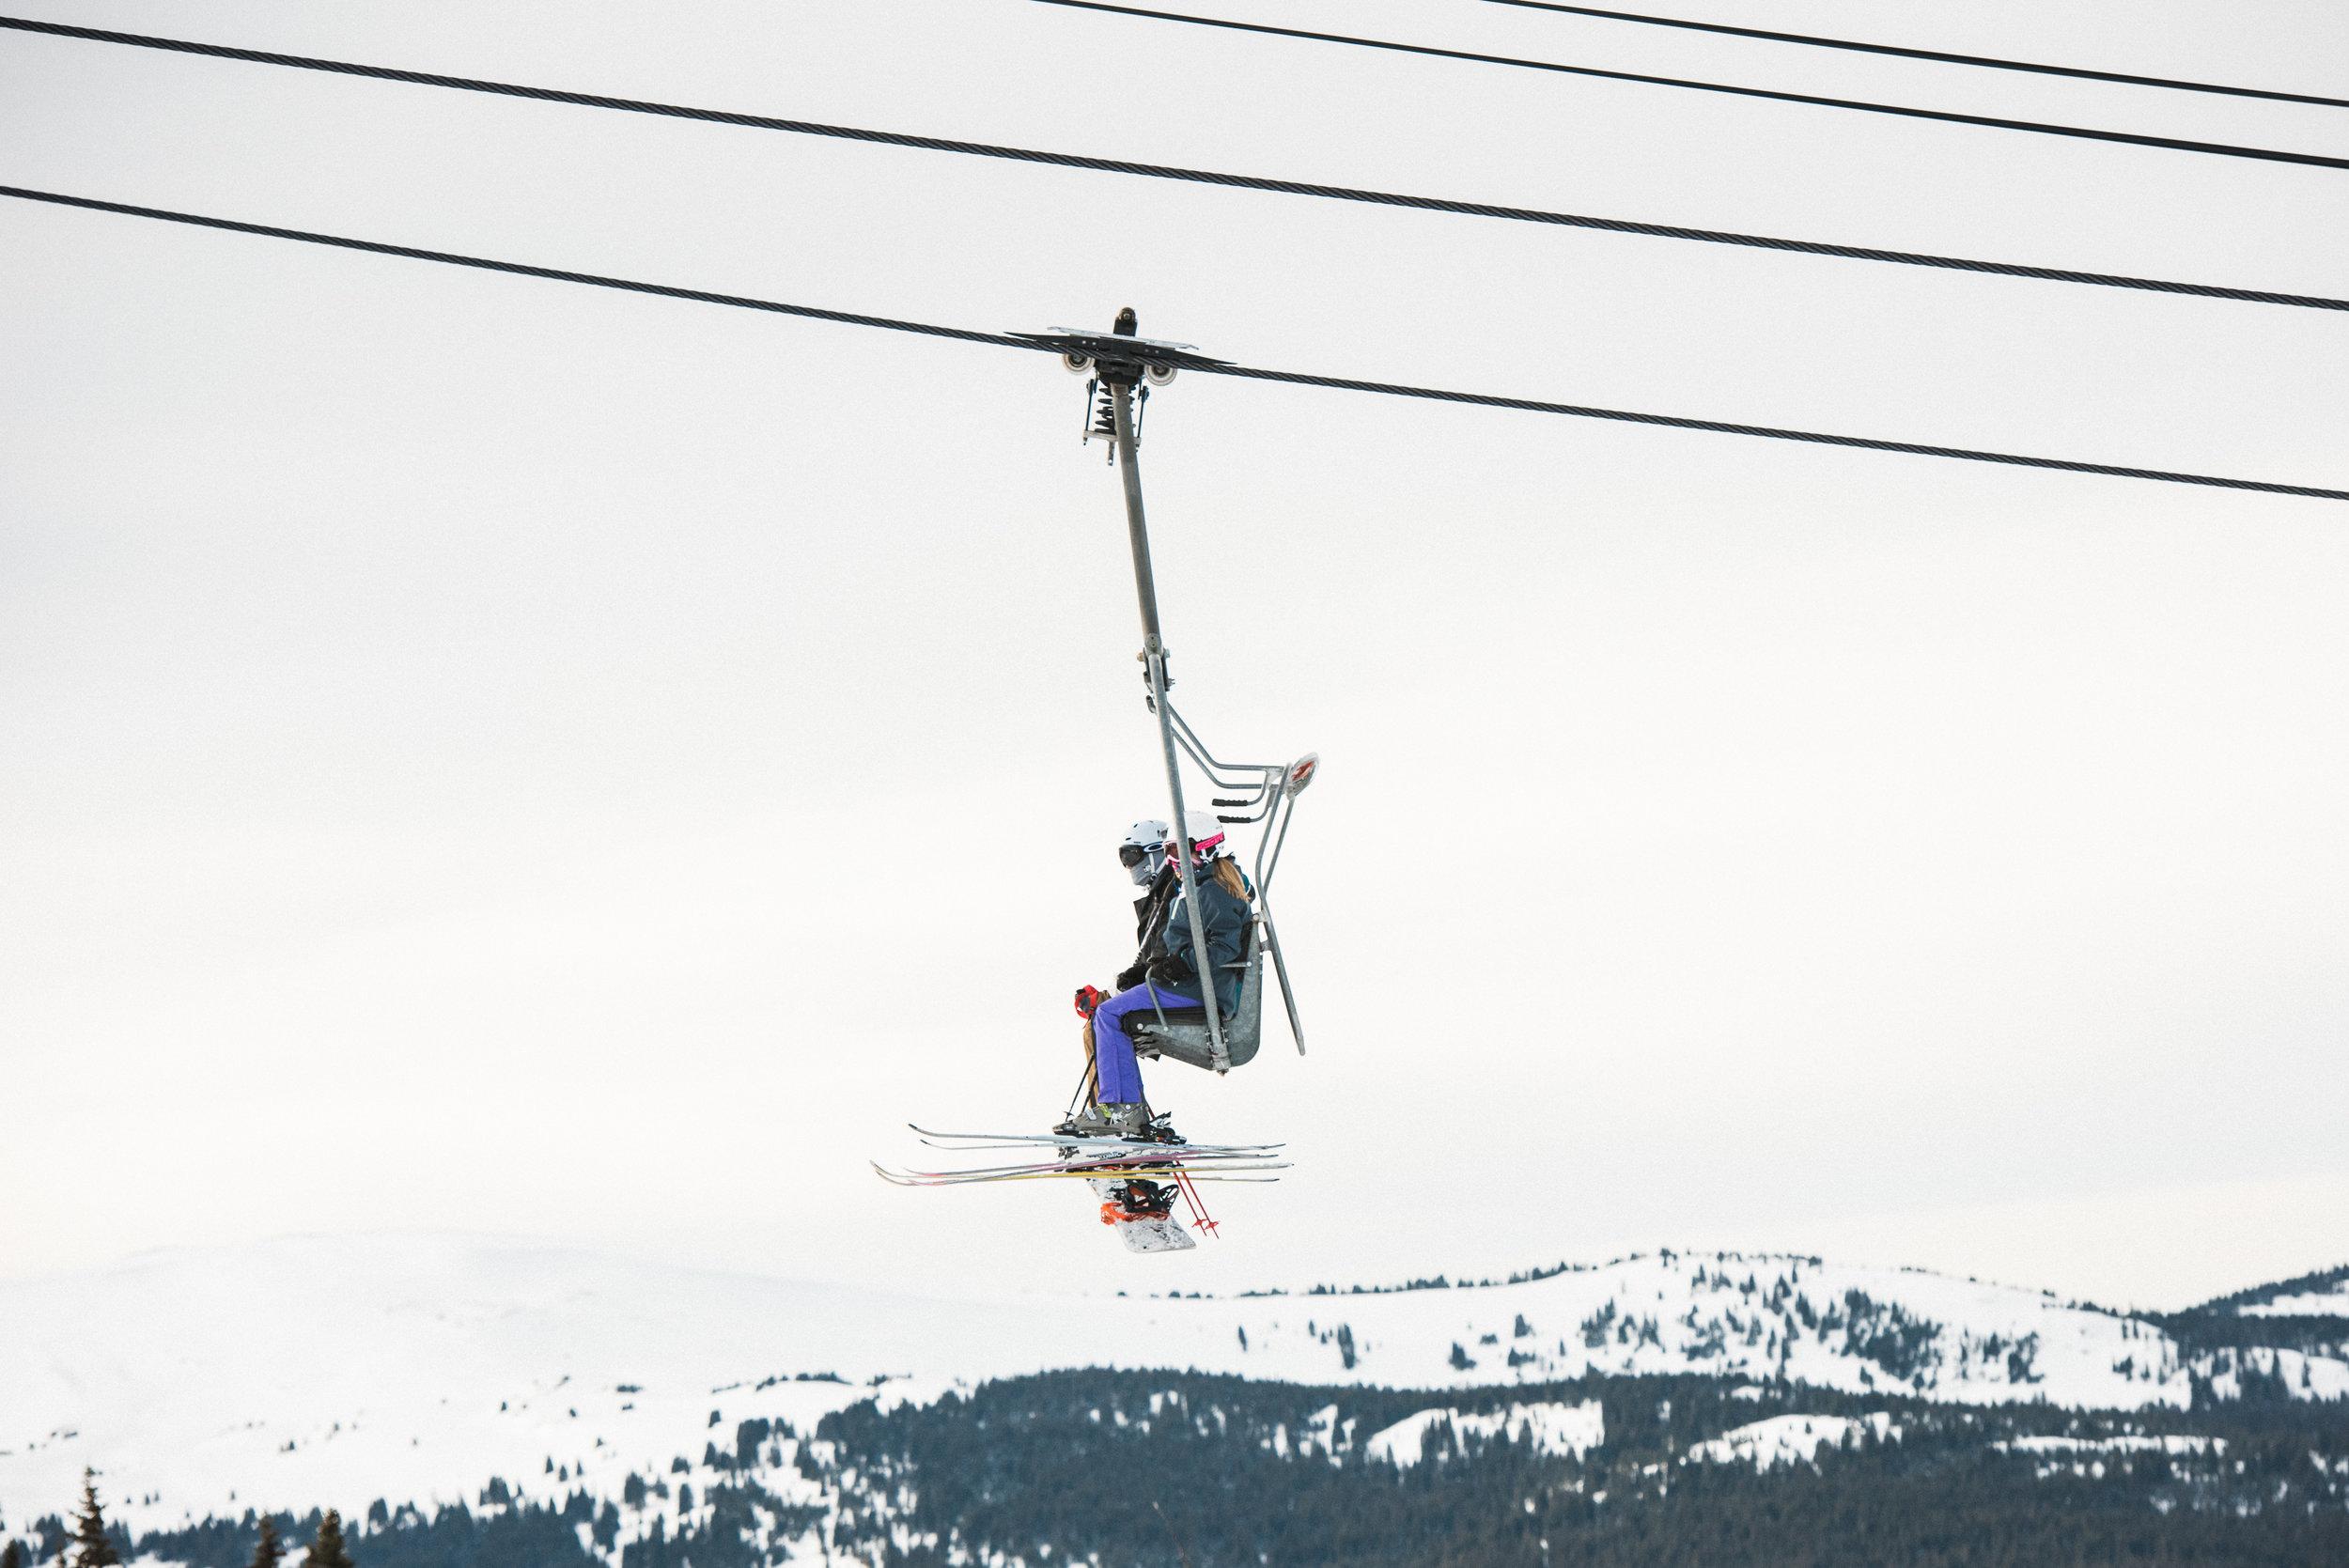 TaraShupe_Outdoor_Photographer_Loweprobags_Colorado_Copper_Mountains_Ski_70.jpg